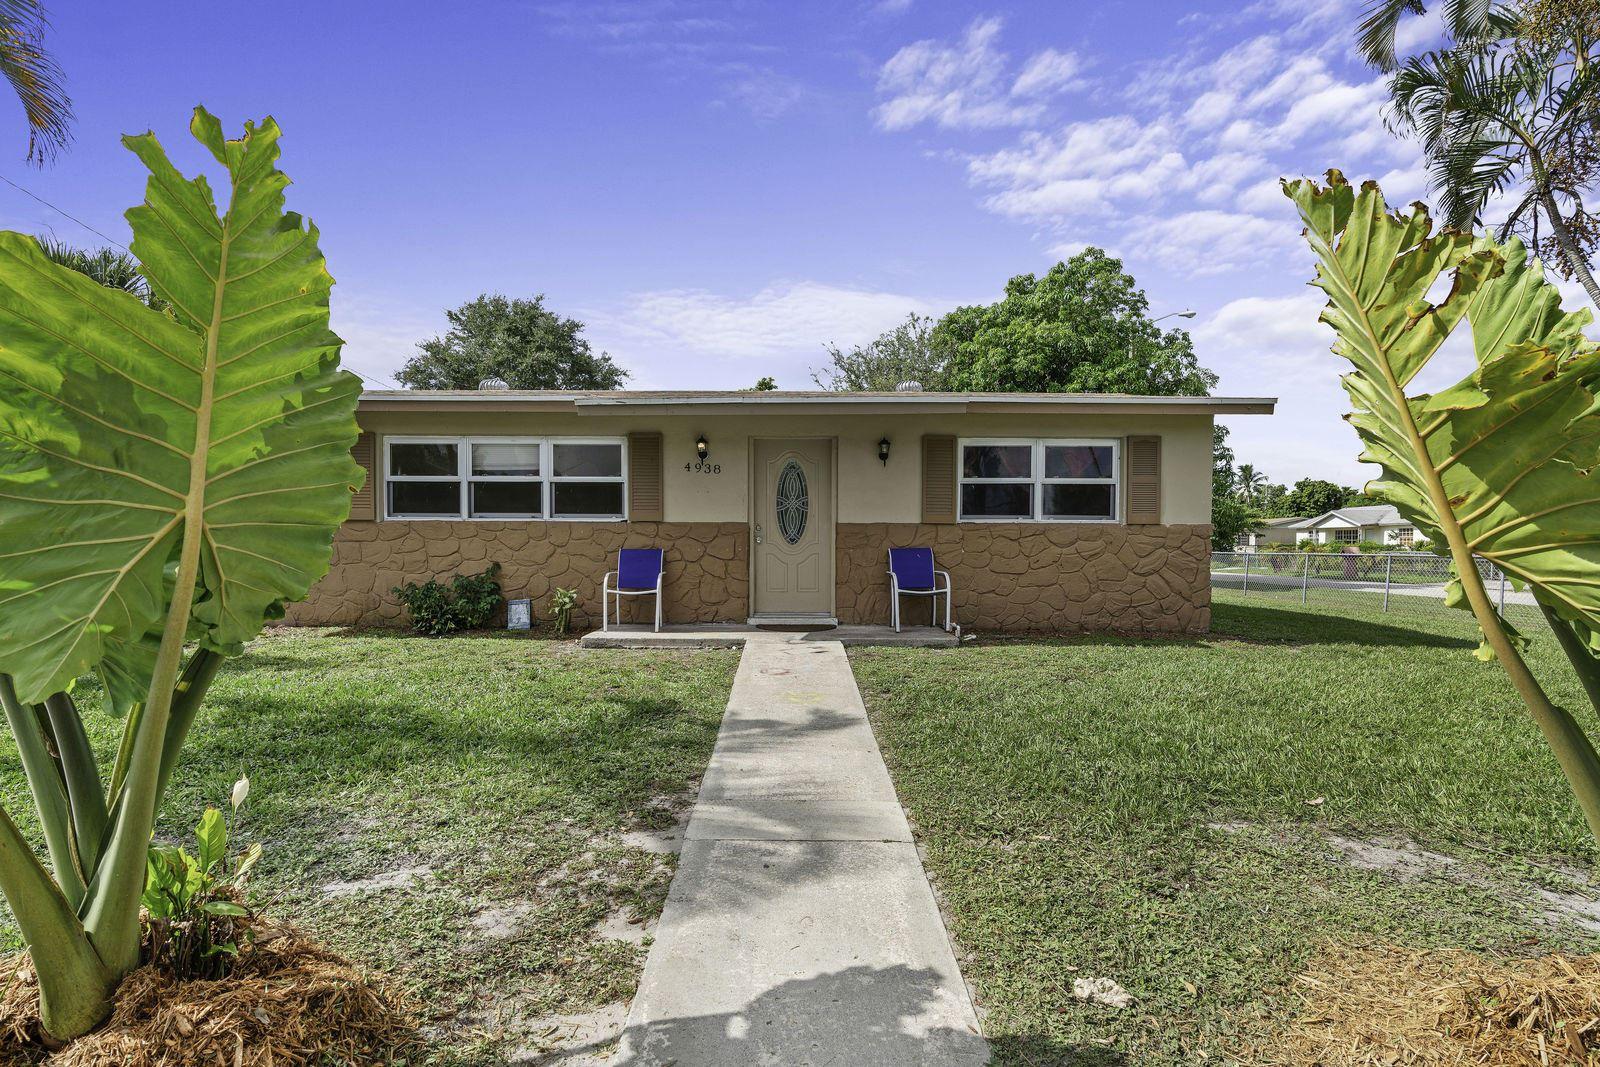 4938 Caribbean Boulevard, West Palm Beach, FL 33407 - MLS#: RX-10621367